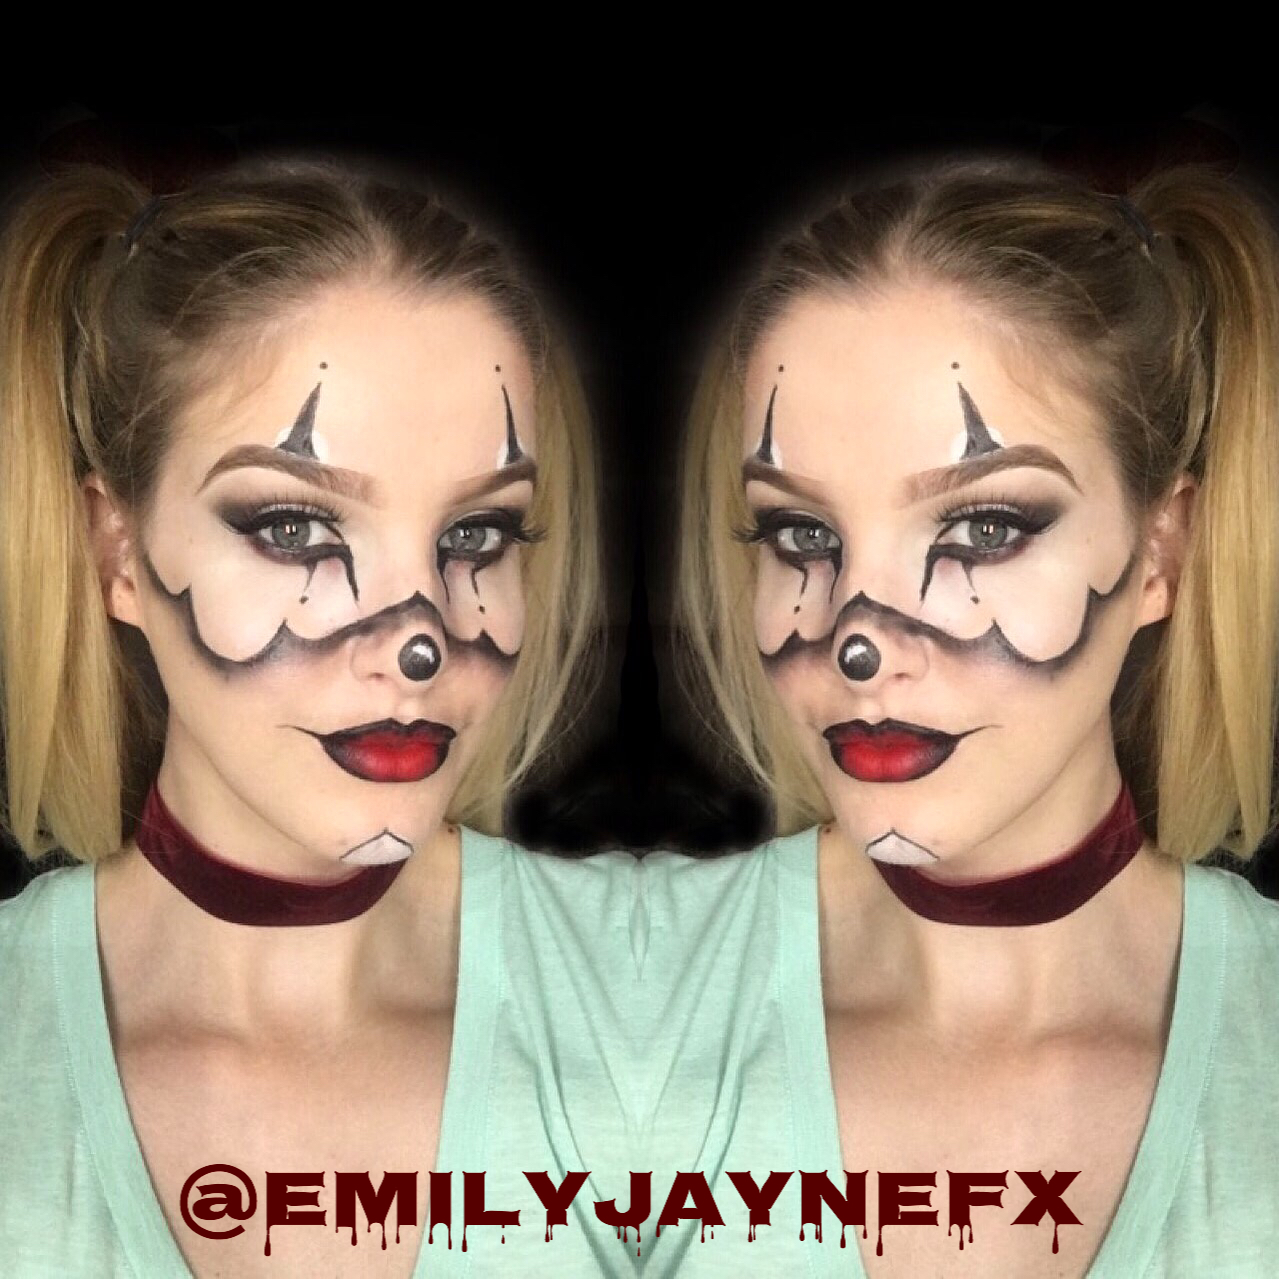 Emilyjaynefx halloween bloody cut crease makeup tutorial cute clown makeup using illamasqua anastasia beverly hills and mac baditri Image collections